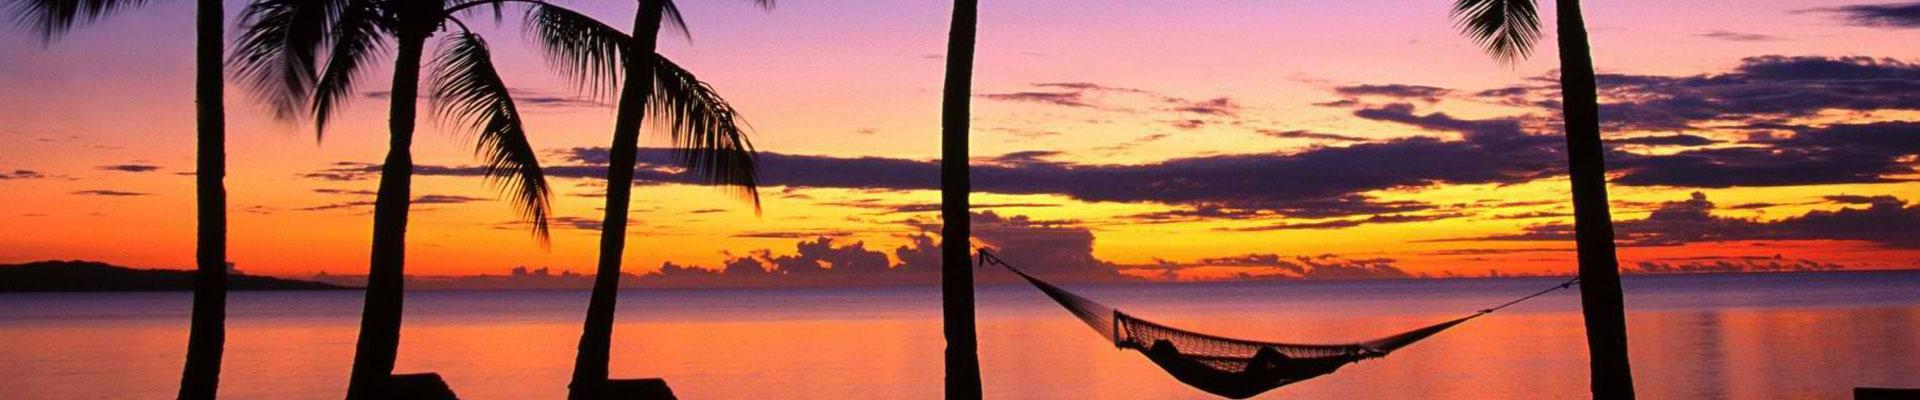 hammocks-caribbean-banner1.jpg